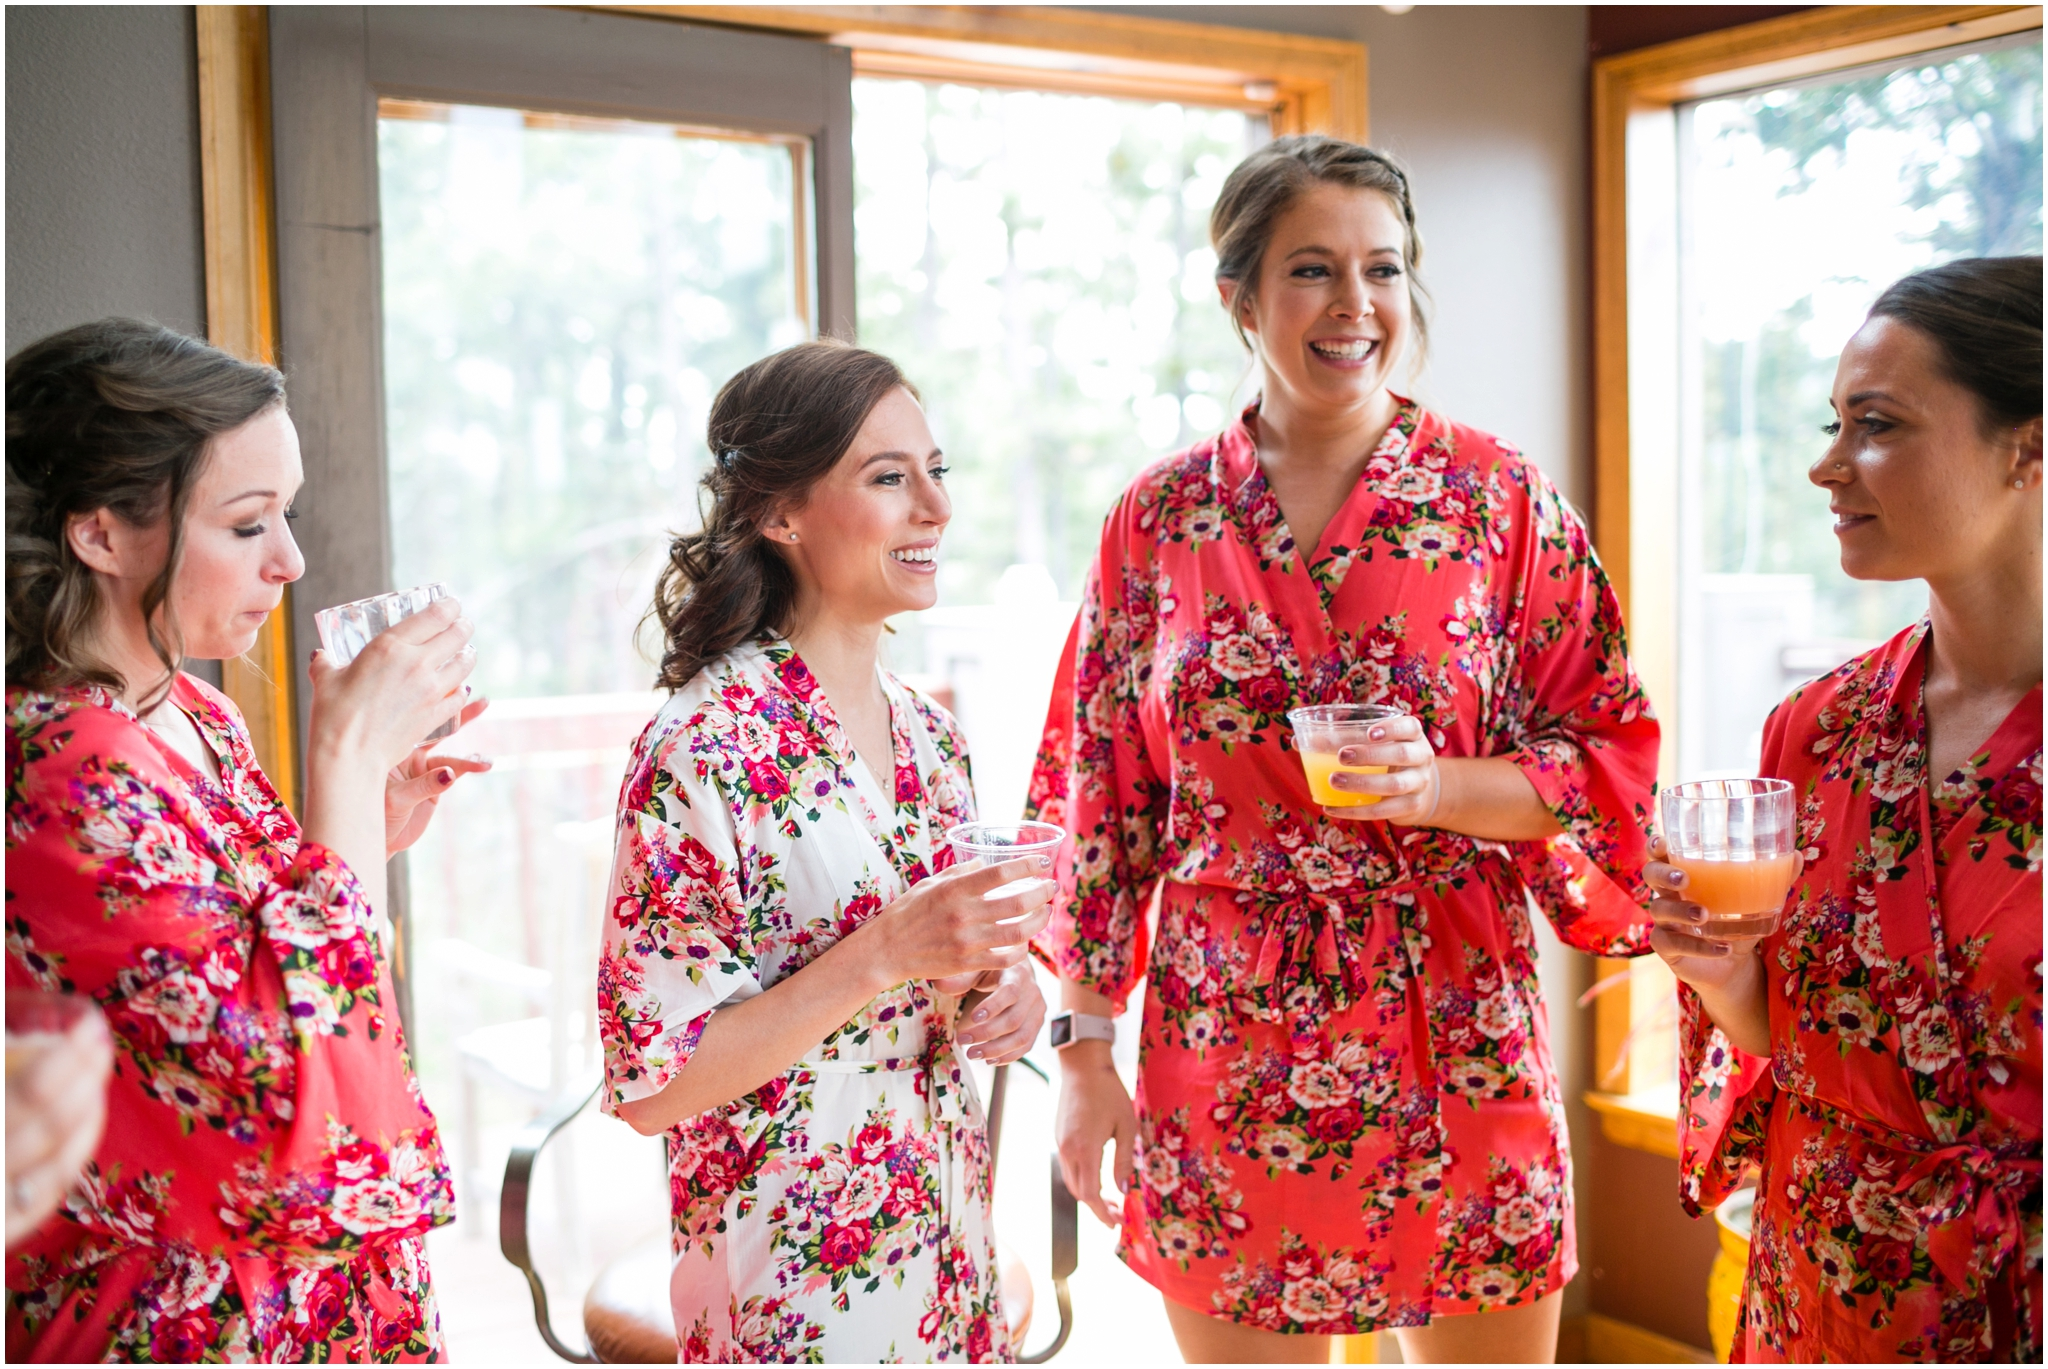 Denver Wedding Photographer_bridesmaids_champagne_toast.JPG